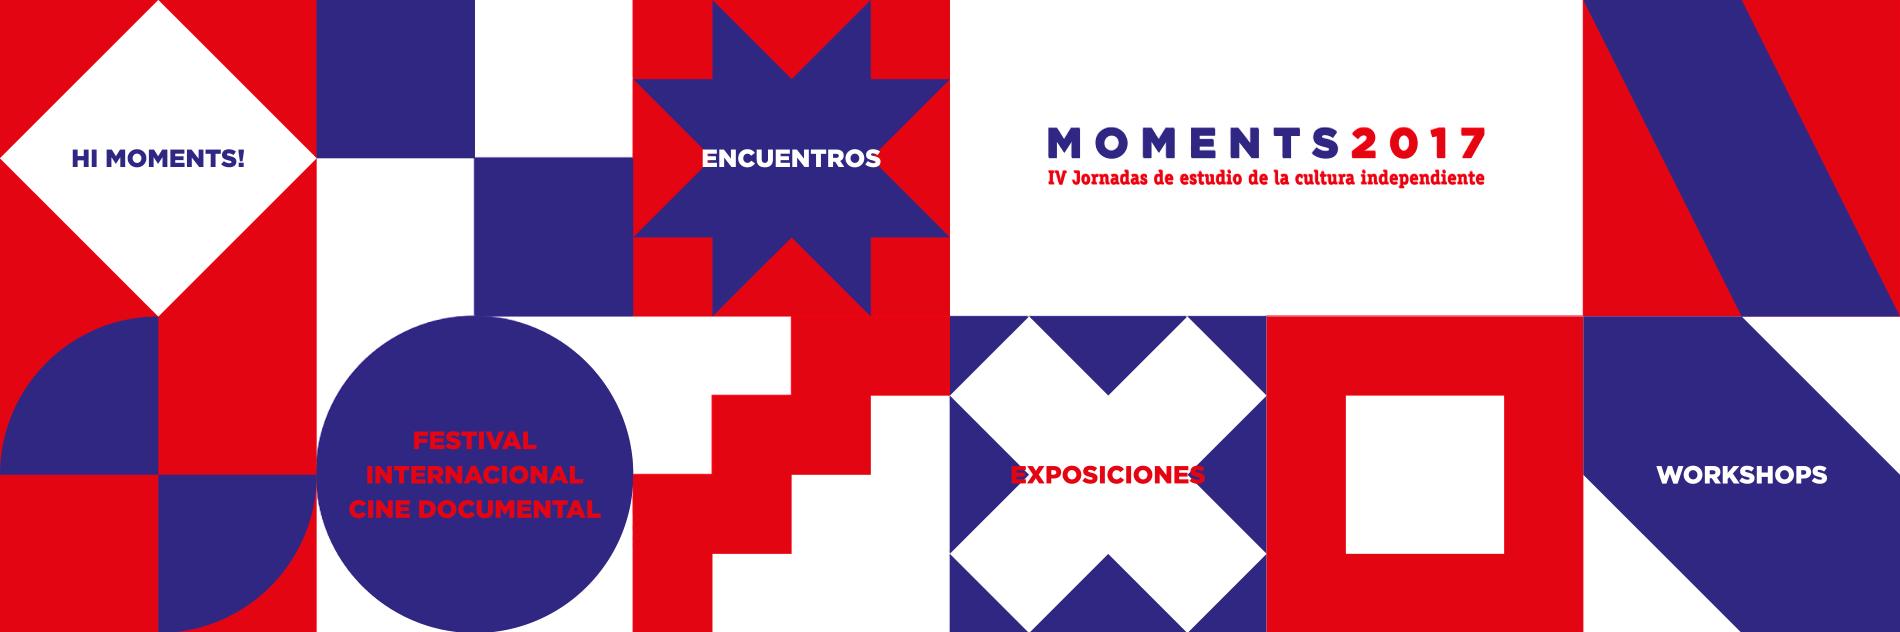 Moments 2017